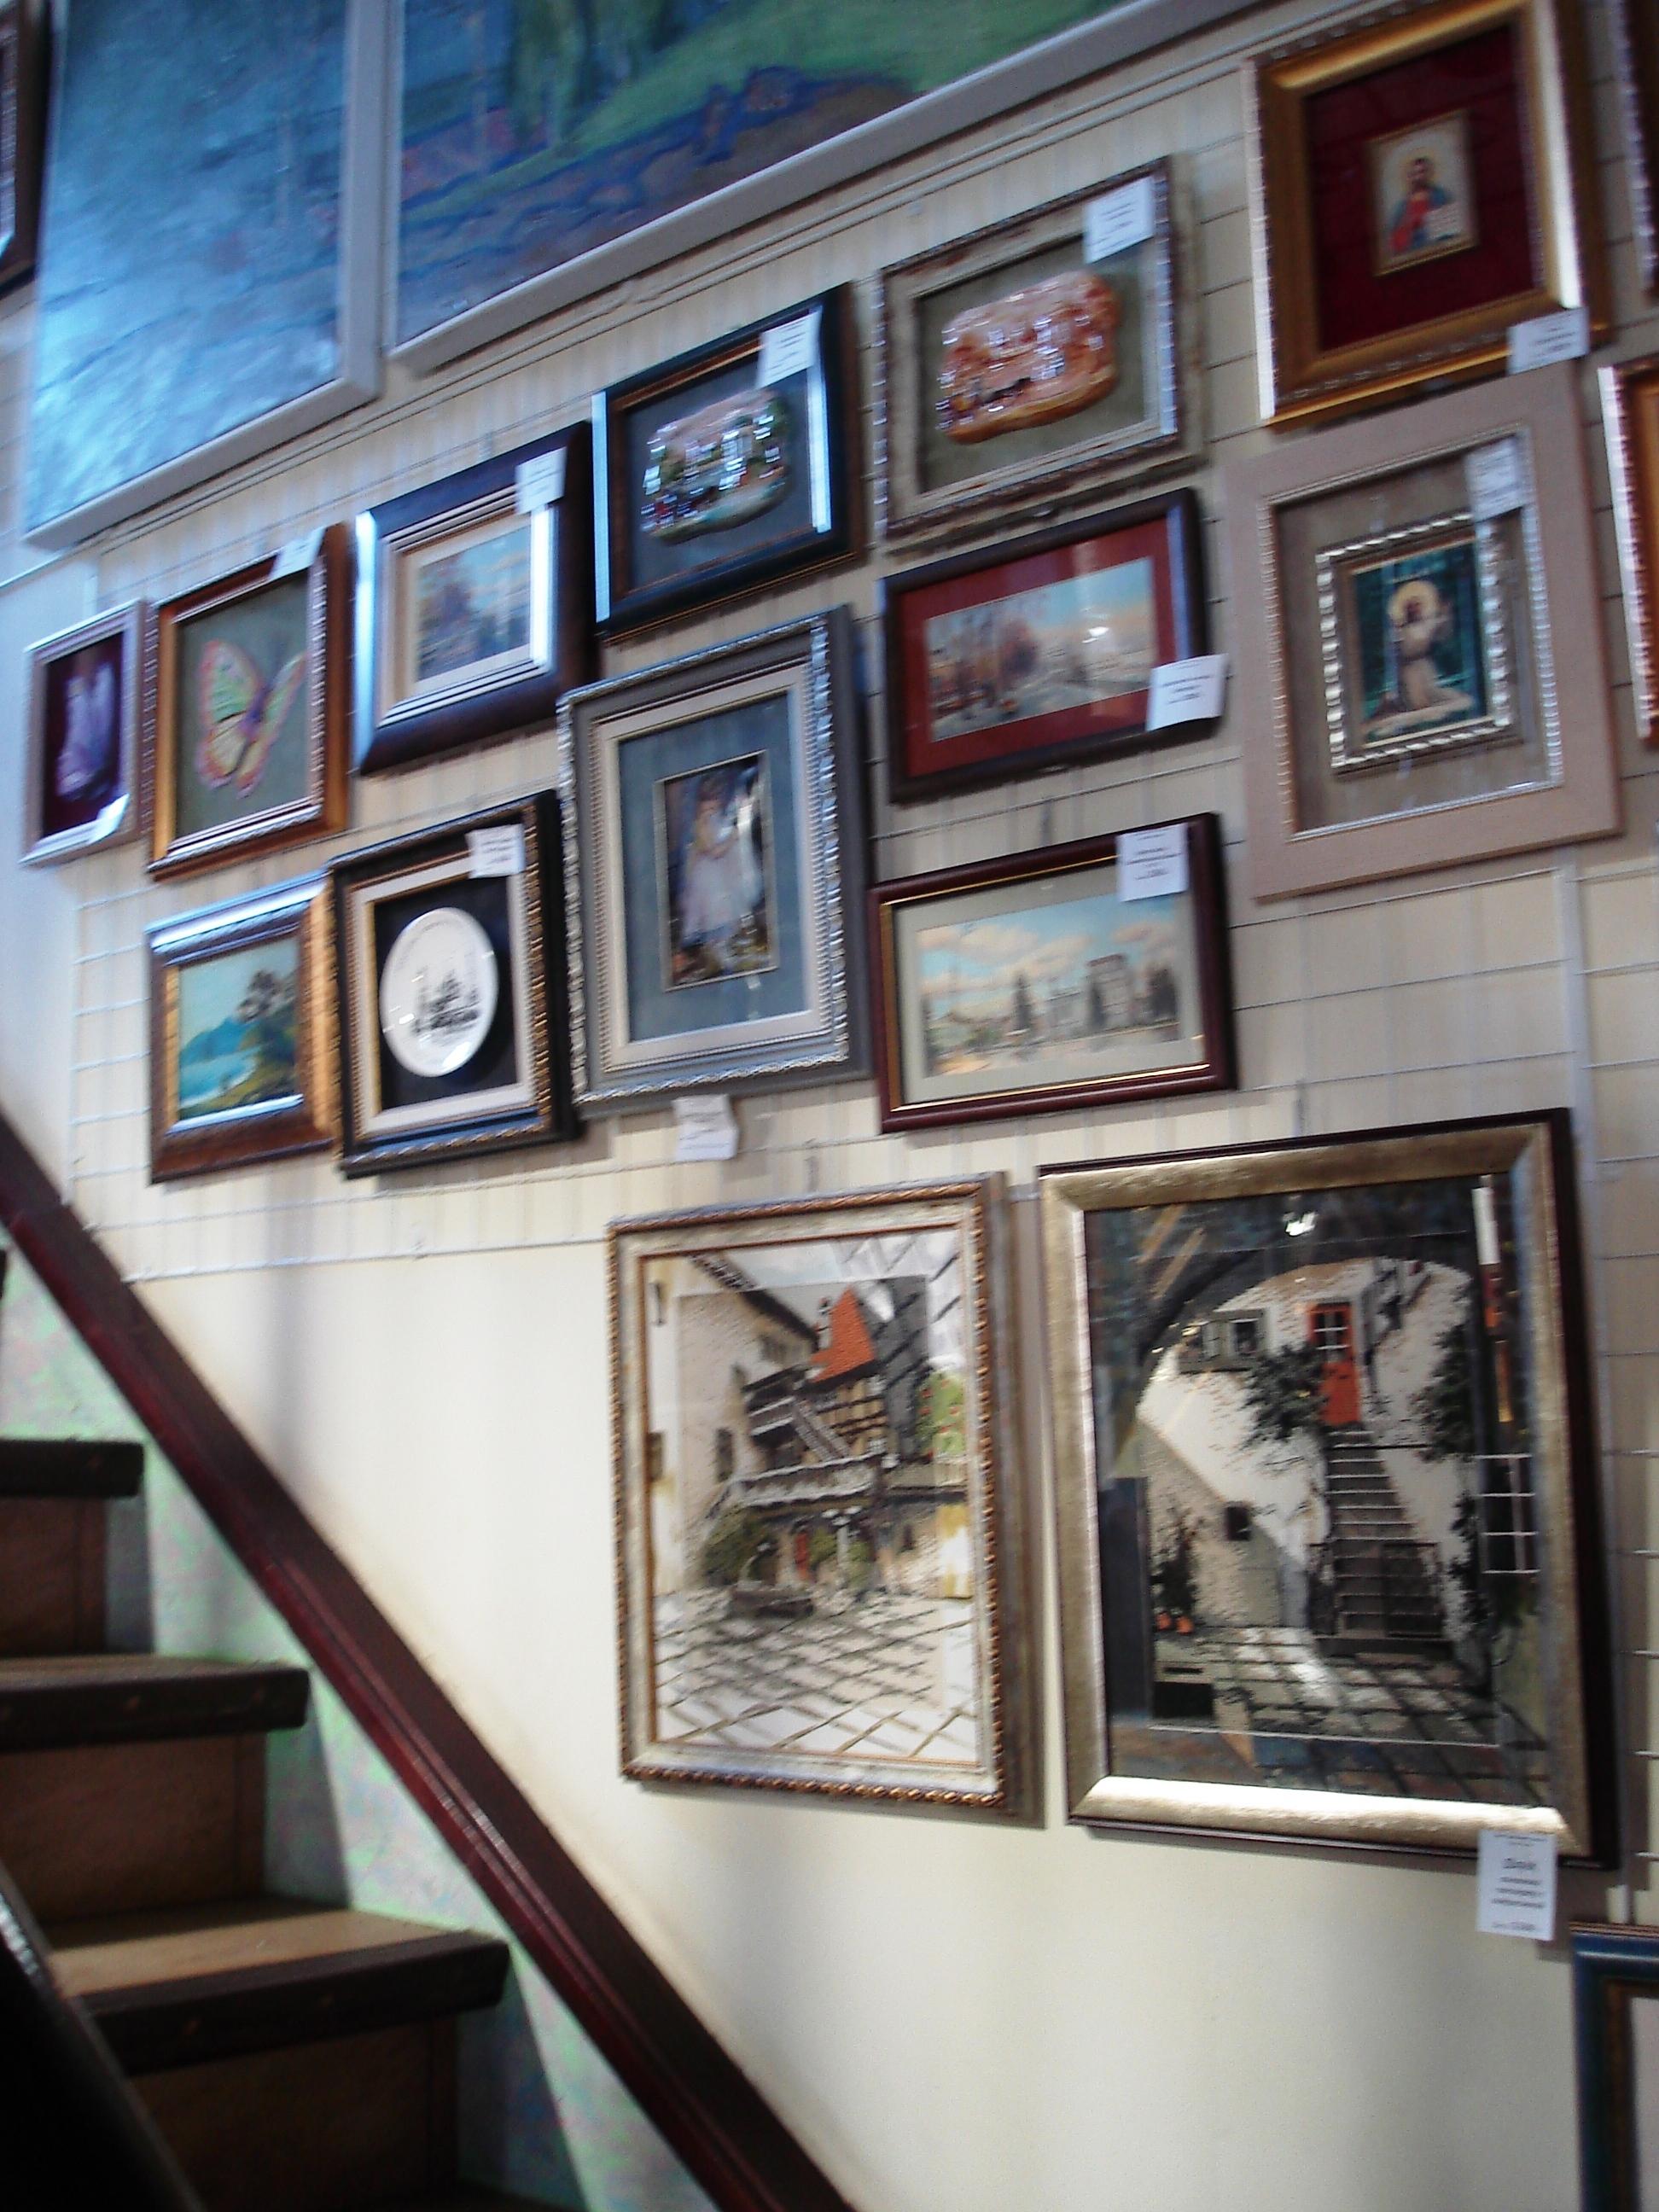 Море суши — Москва, Тихвинская, 12 Кафе, бары и рестораны